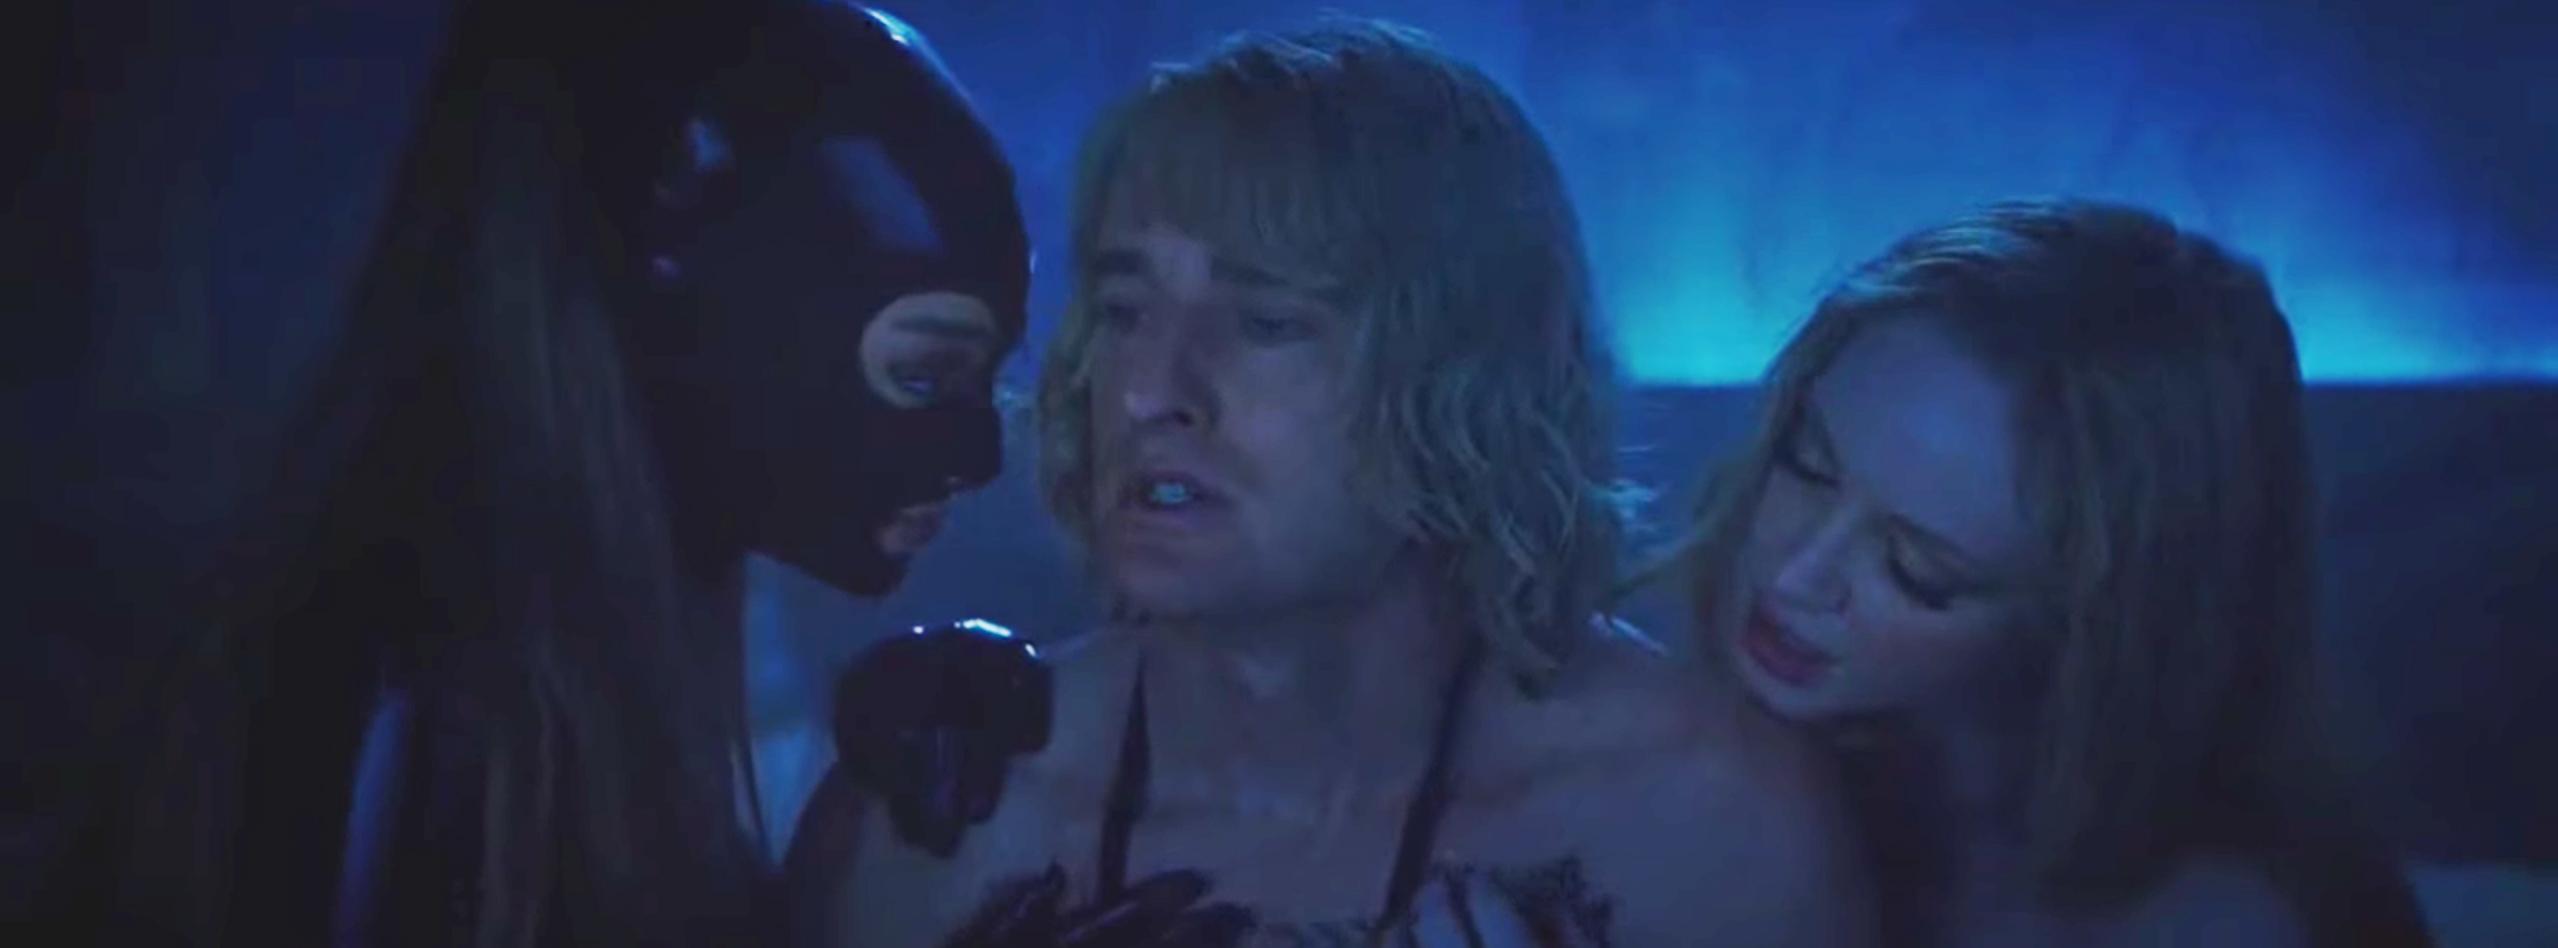 Anal orgasm video